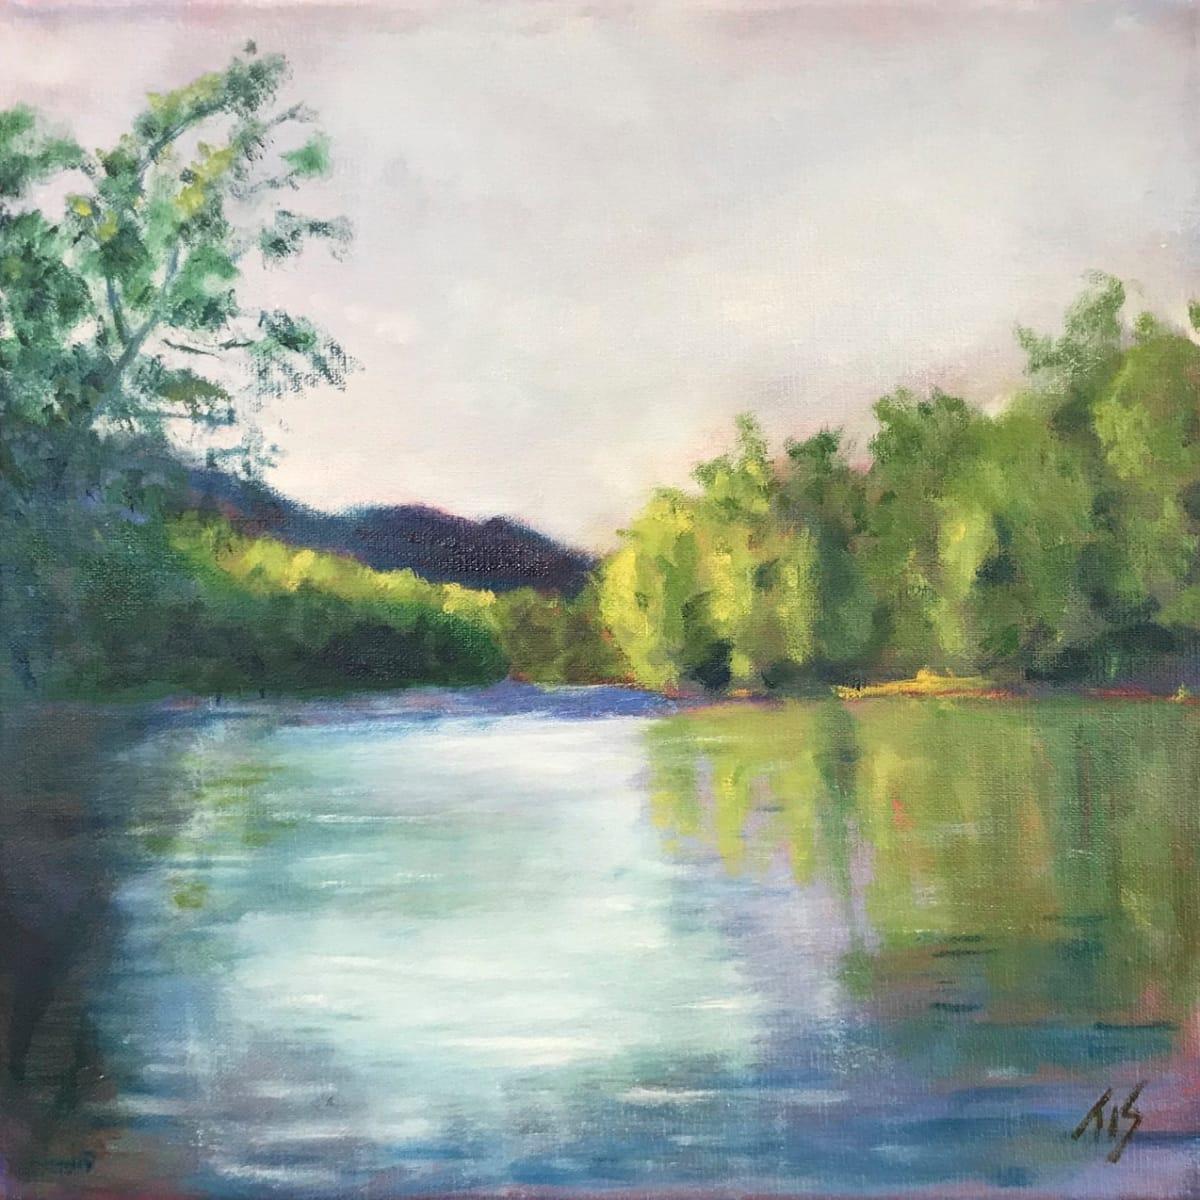 James River View I by Thomas Stevens